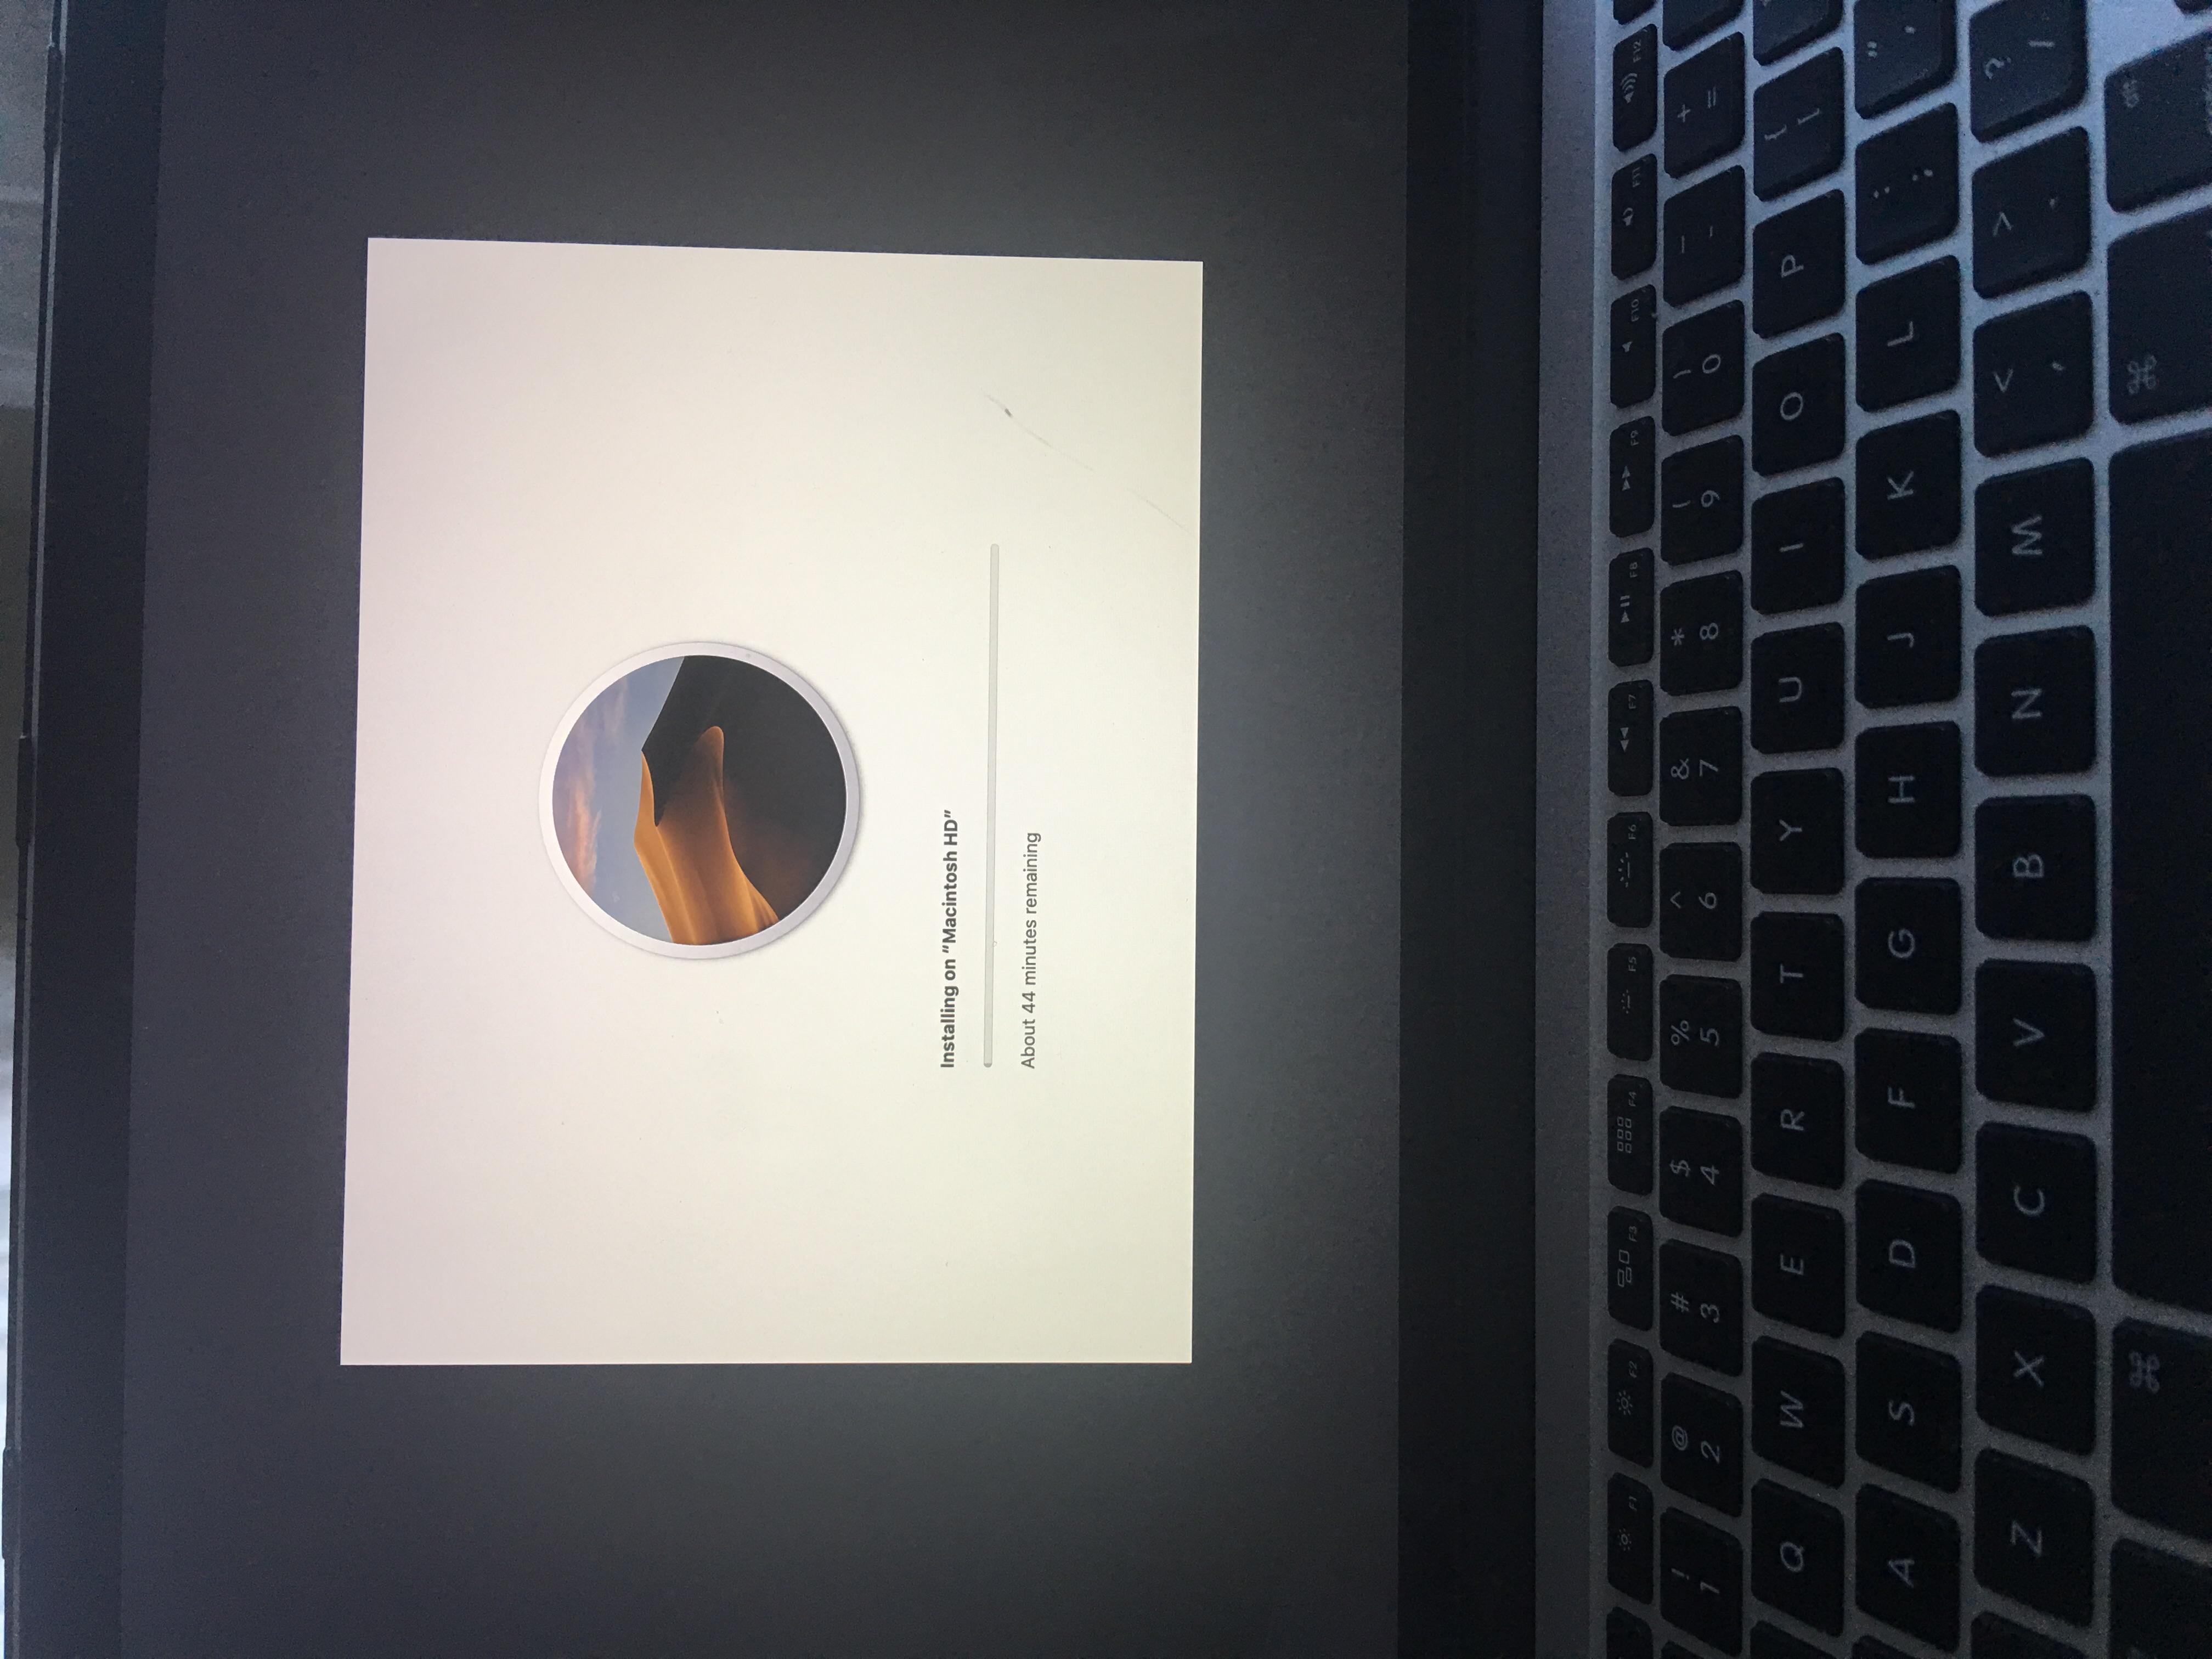 Mojave 10 14 1 update stuck on installing - Apple Community